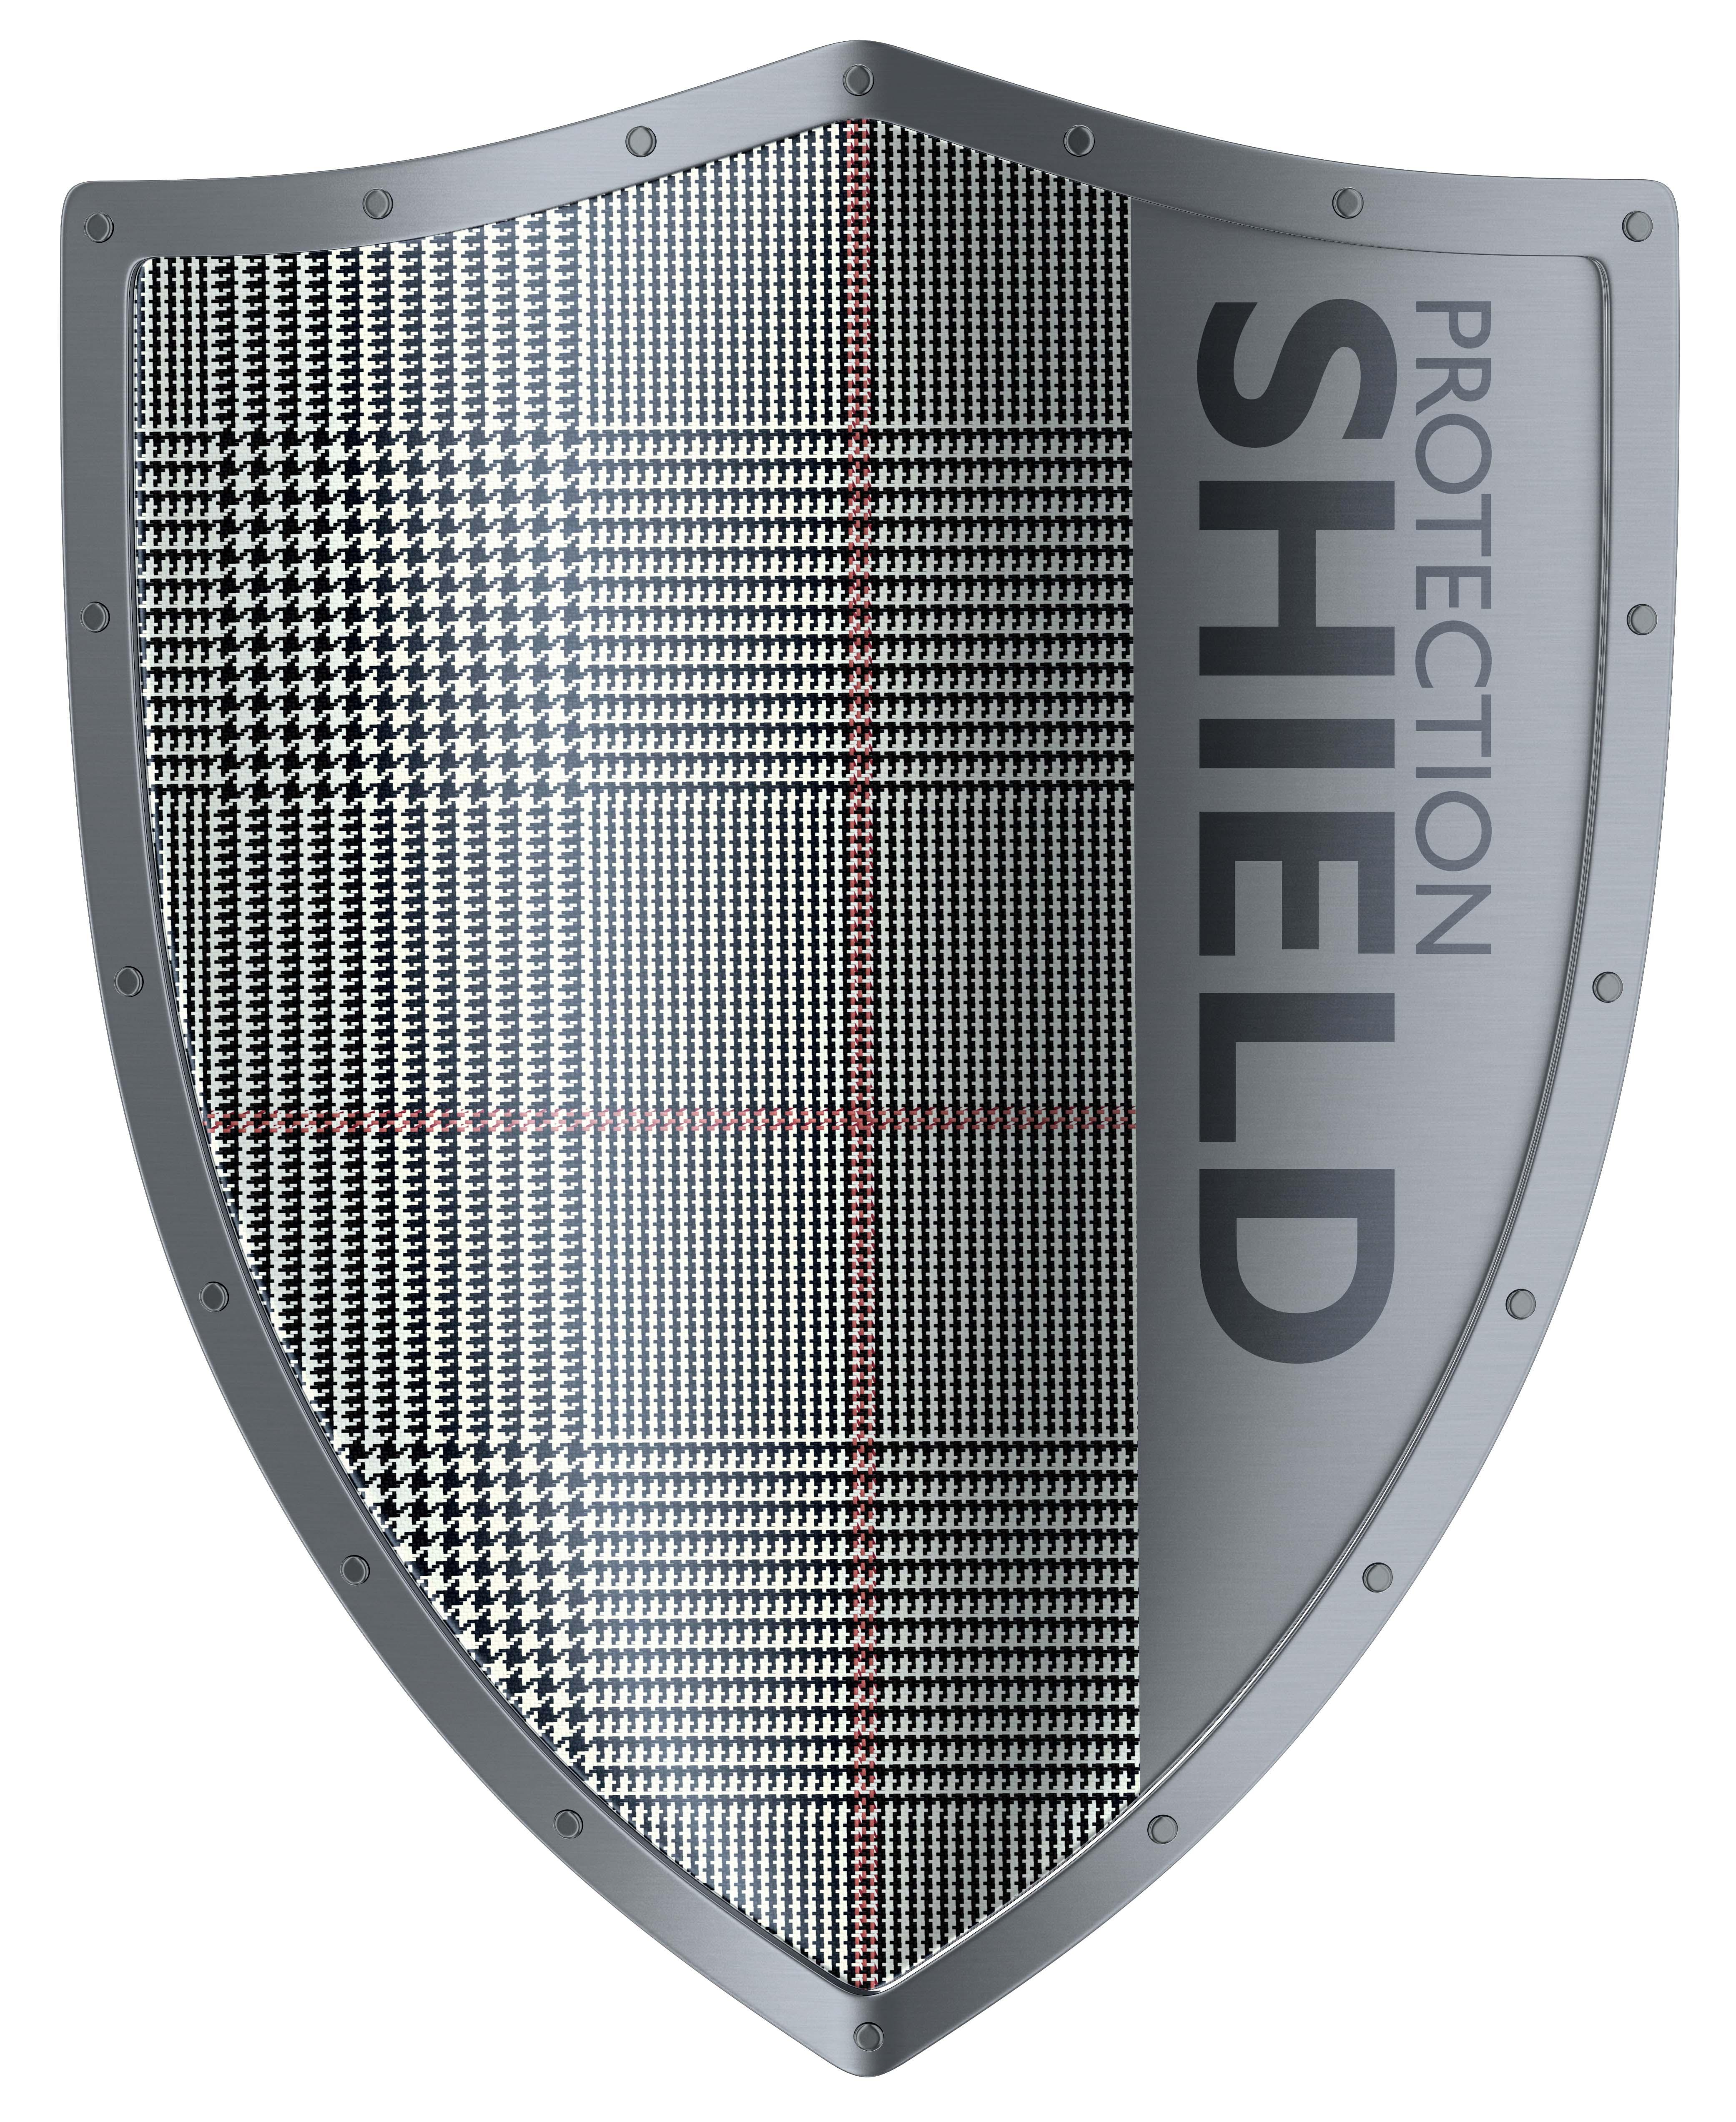 Shield 3d rendering